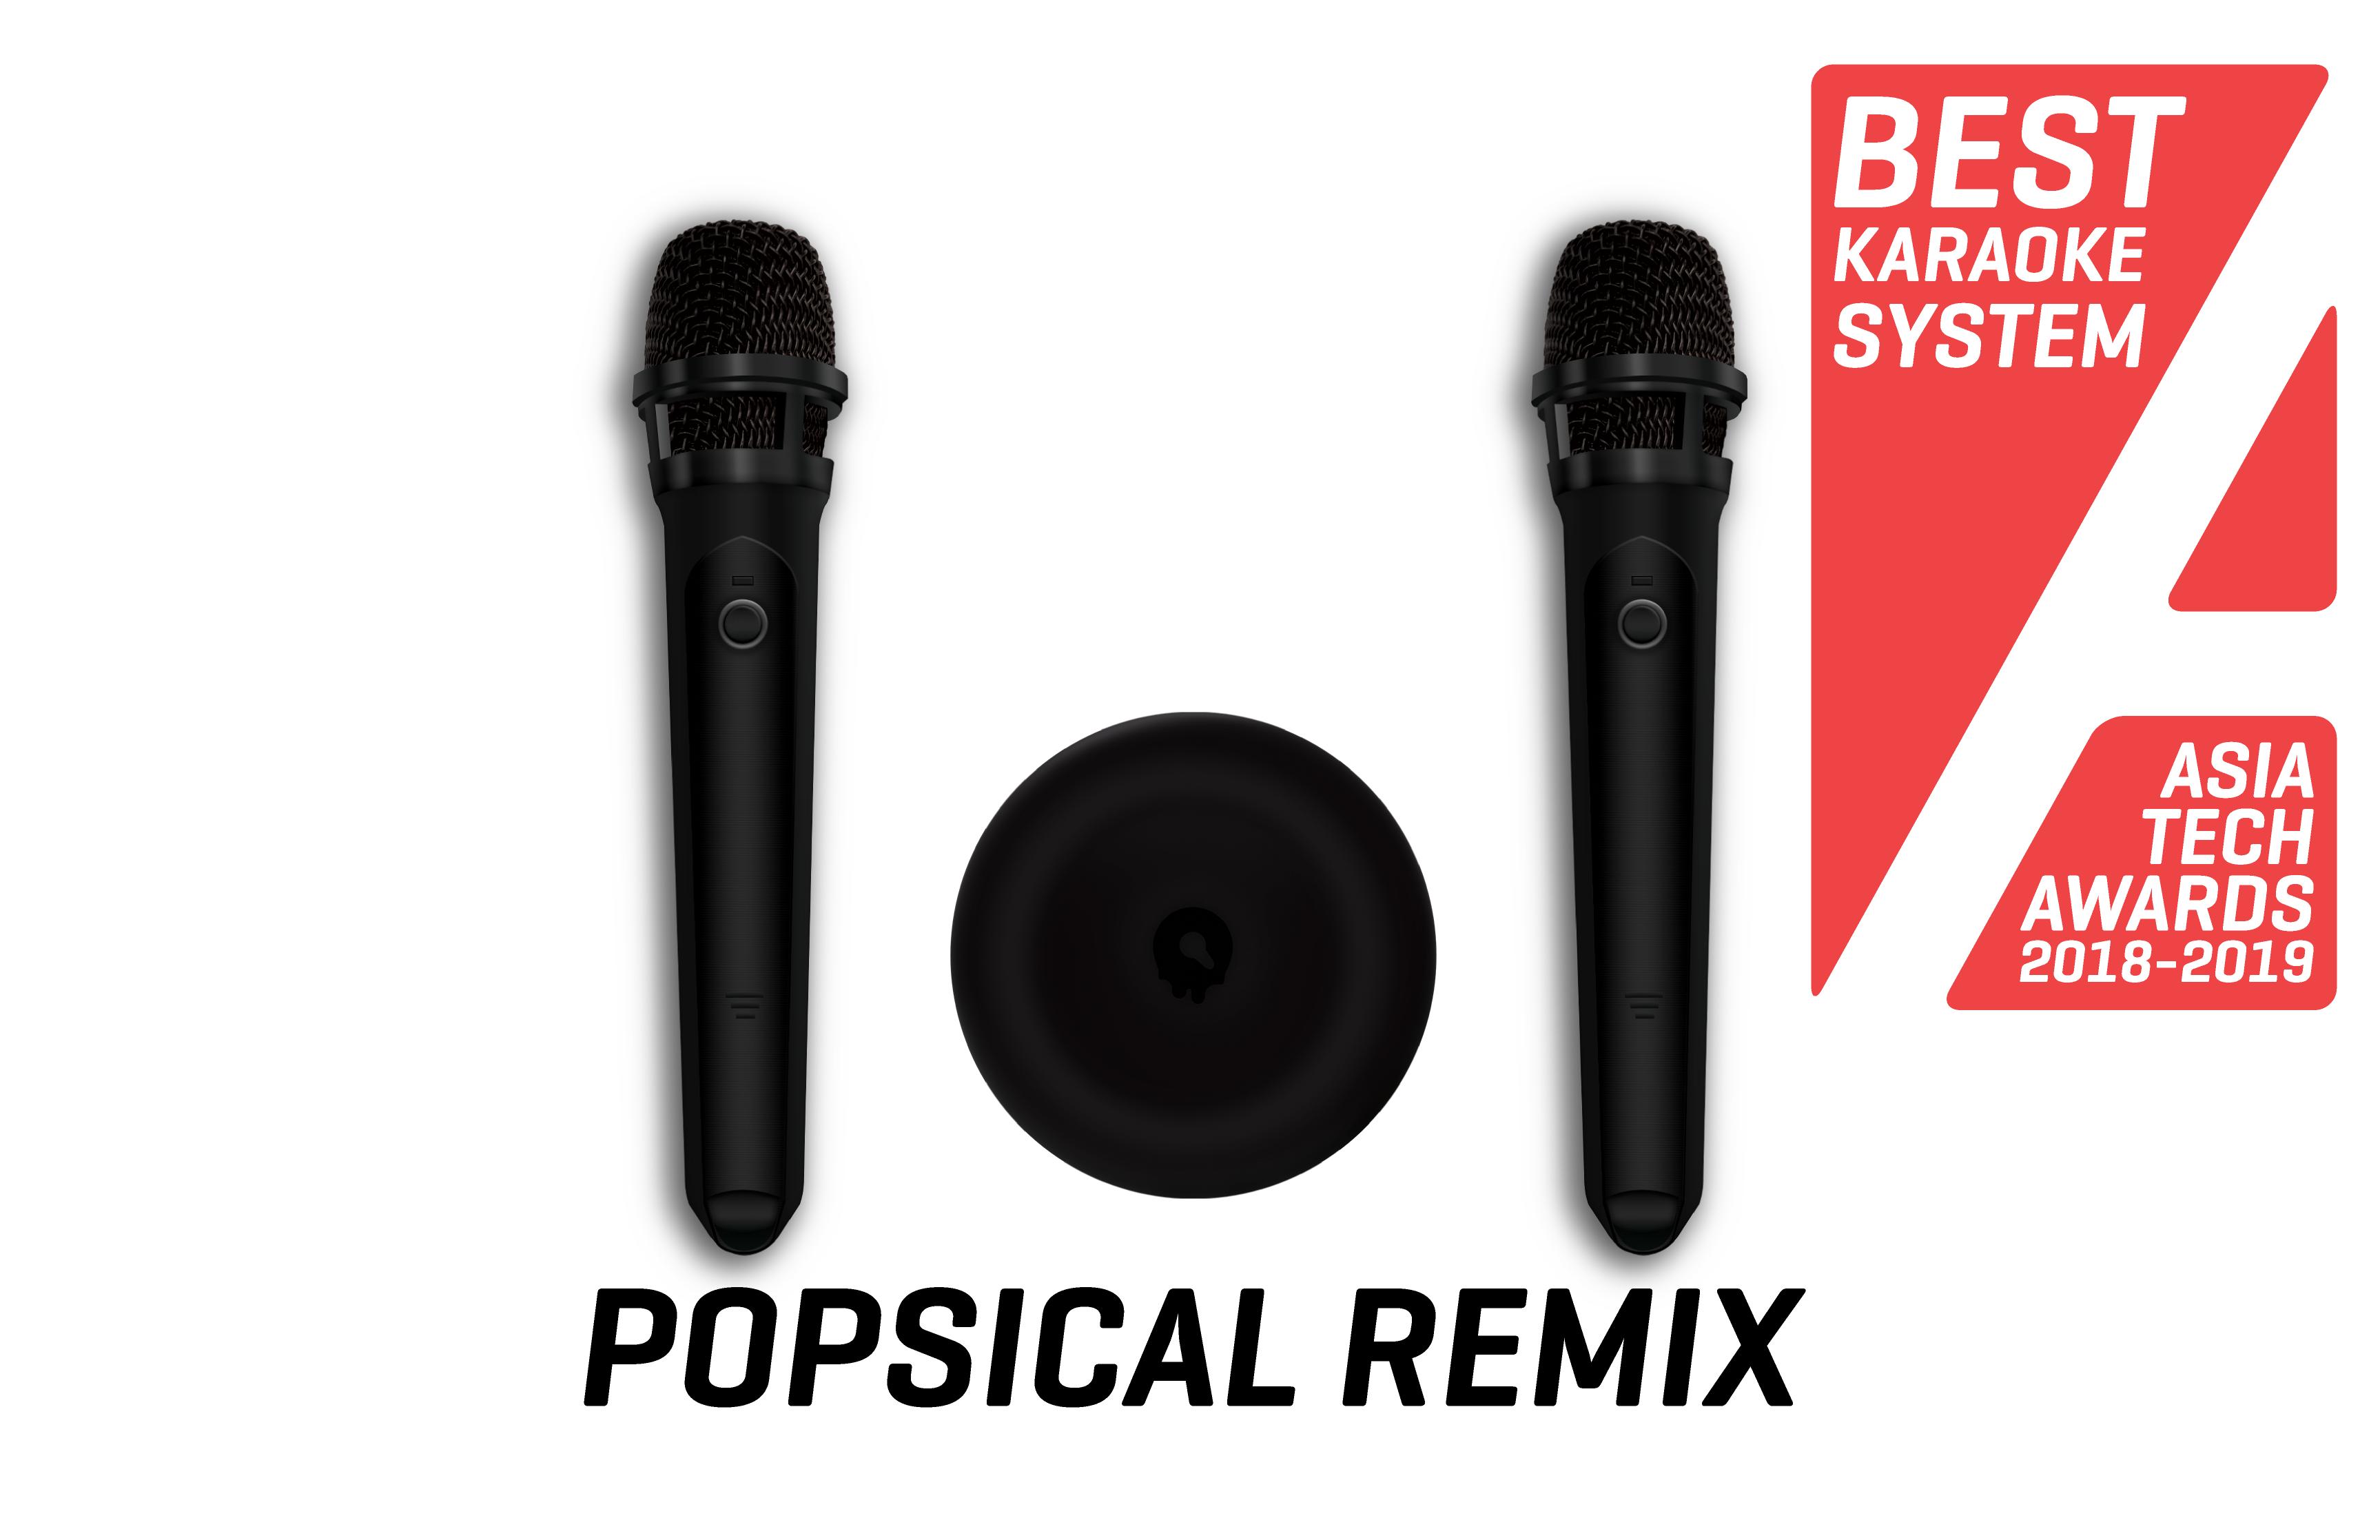 POPSICAL REMIX